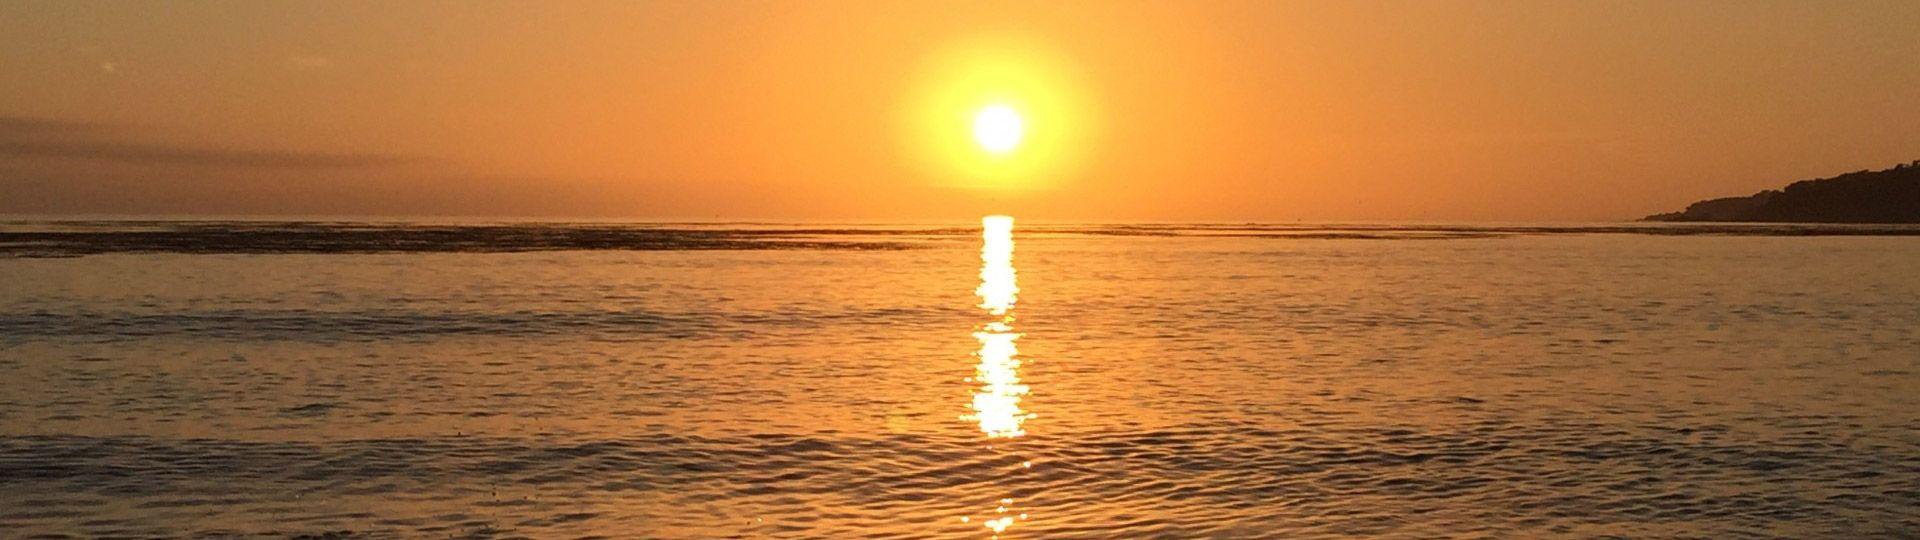 Carmel Beach Sunset